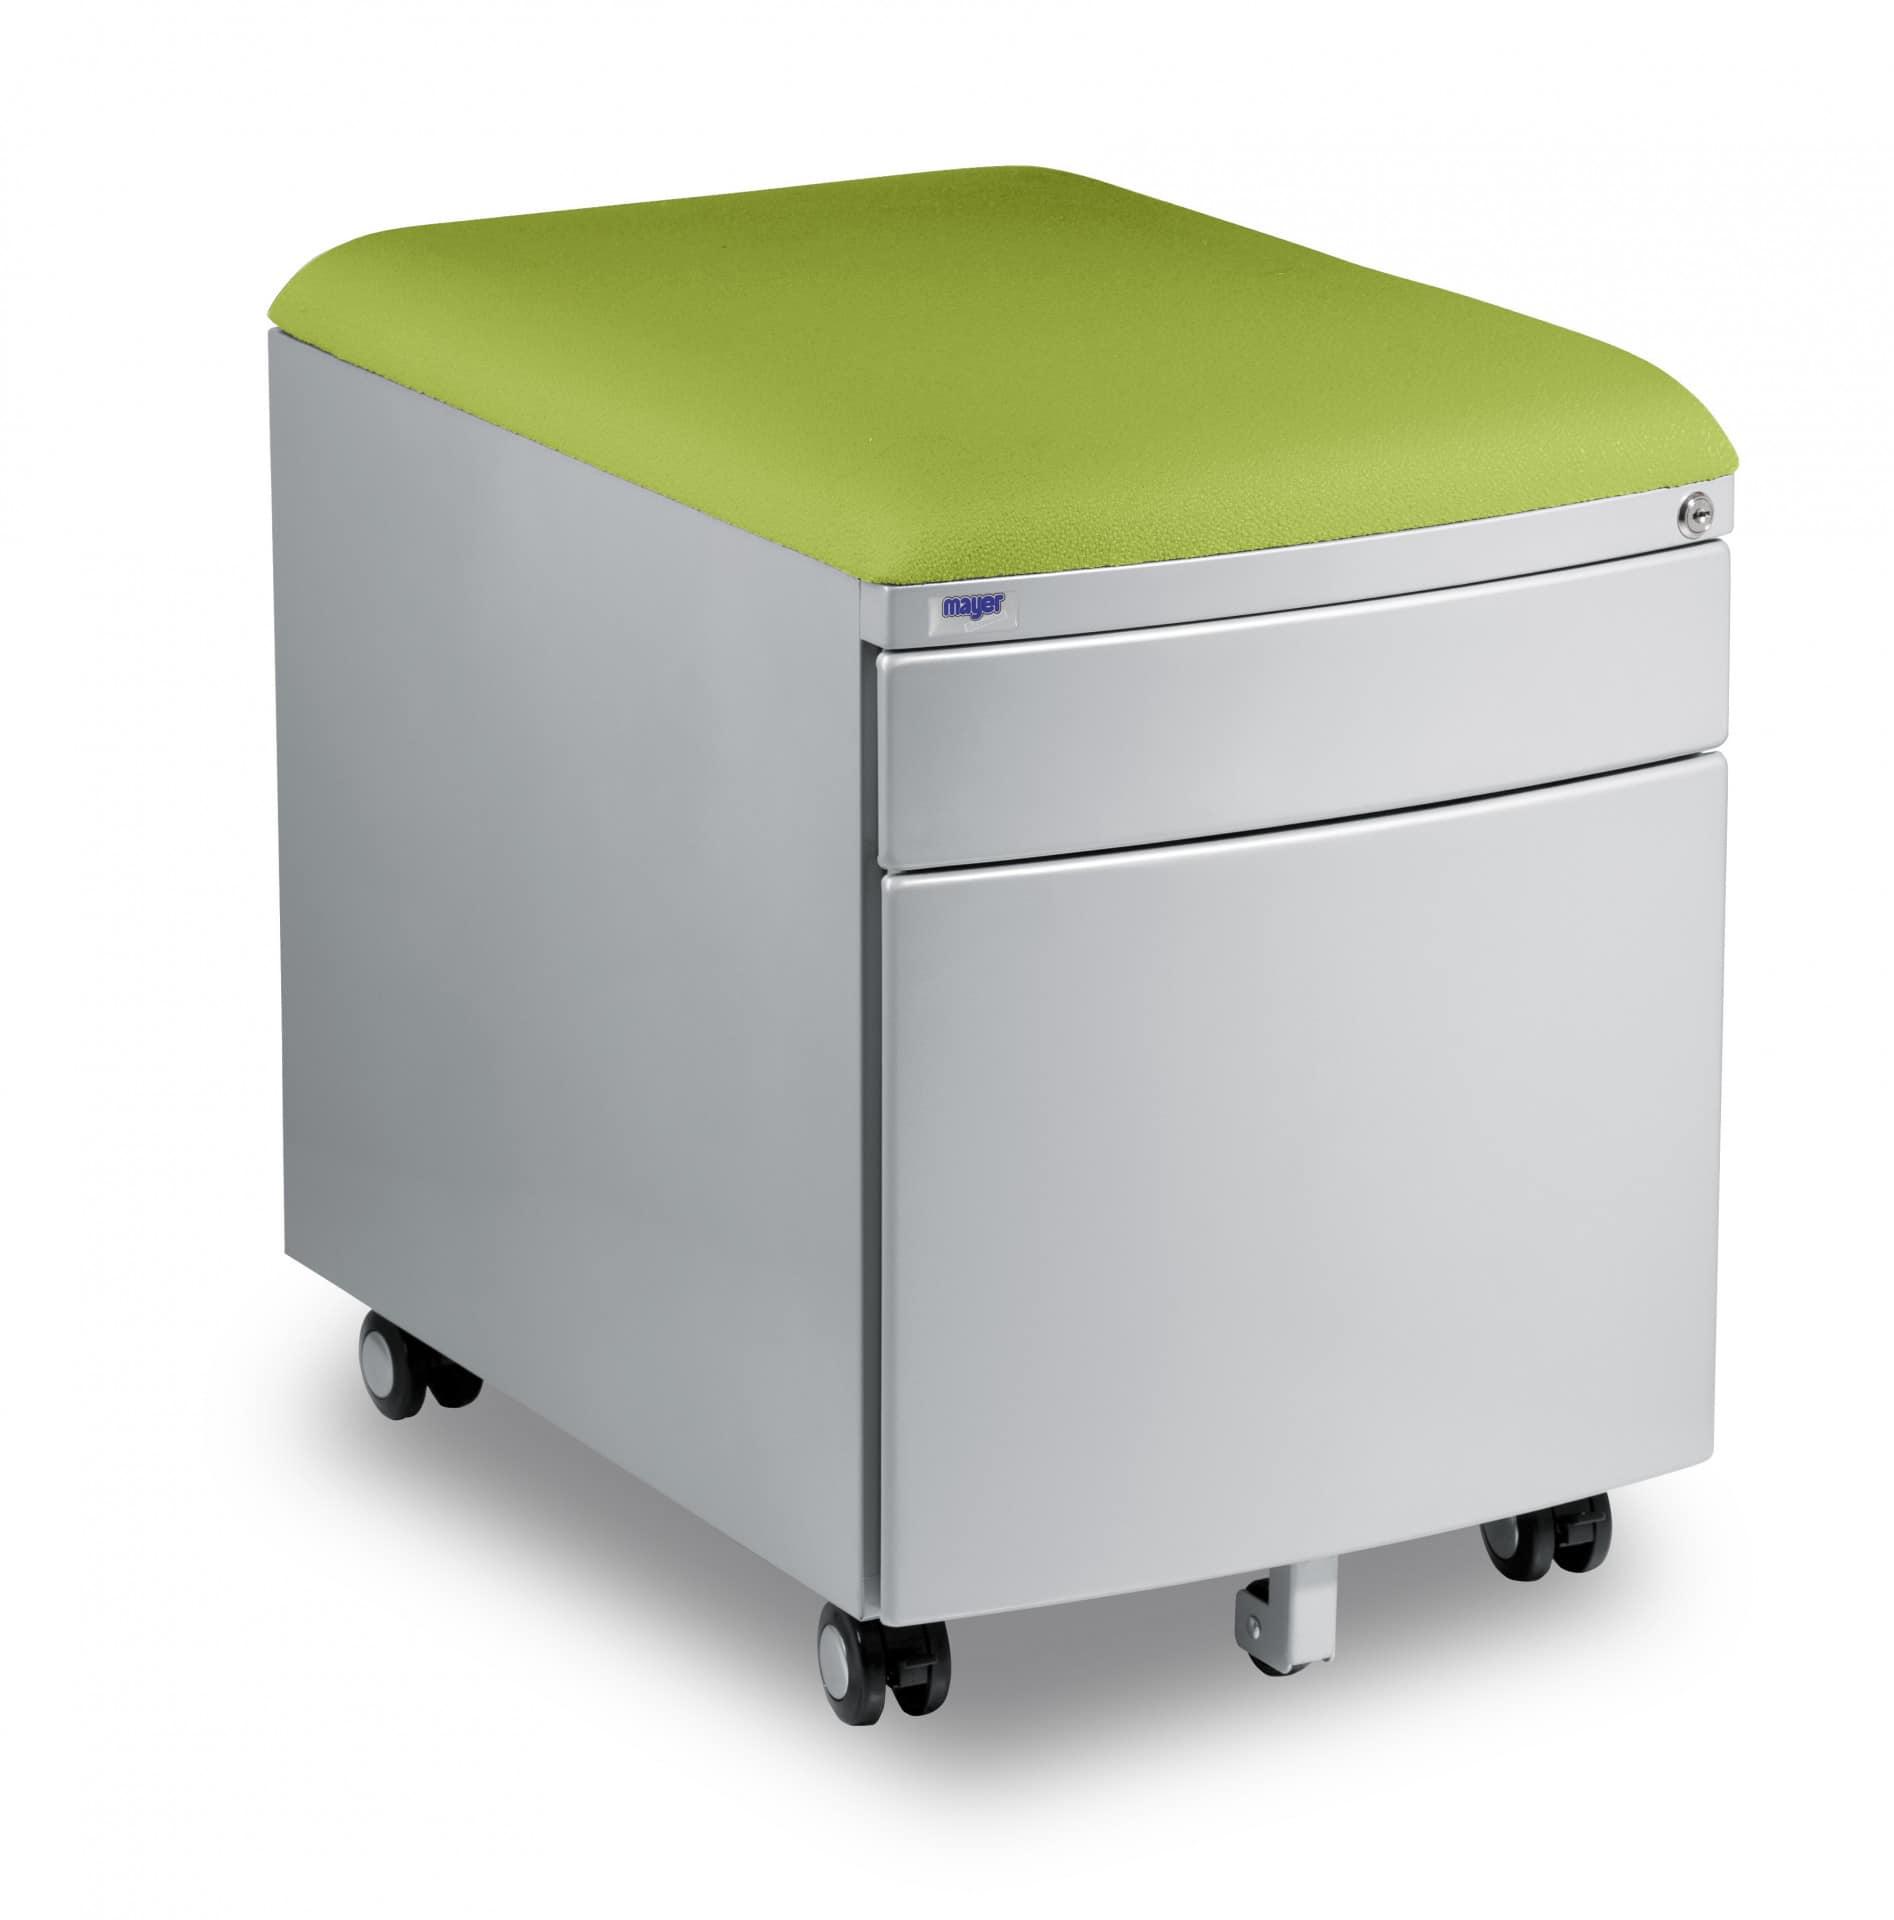 Kontejner Mayer - potah aquaclean zelený